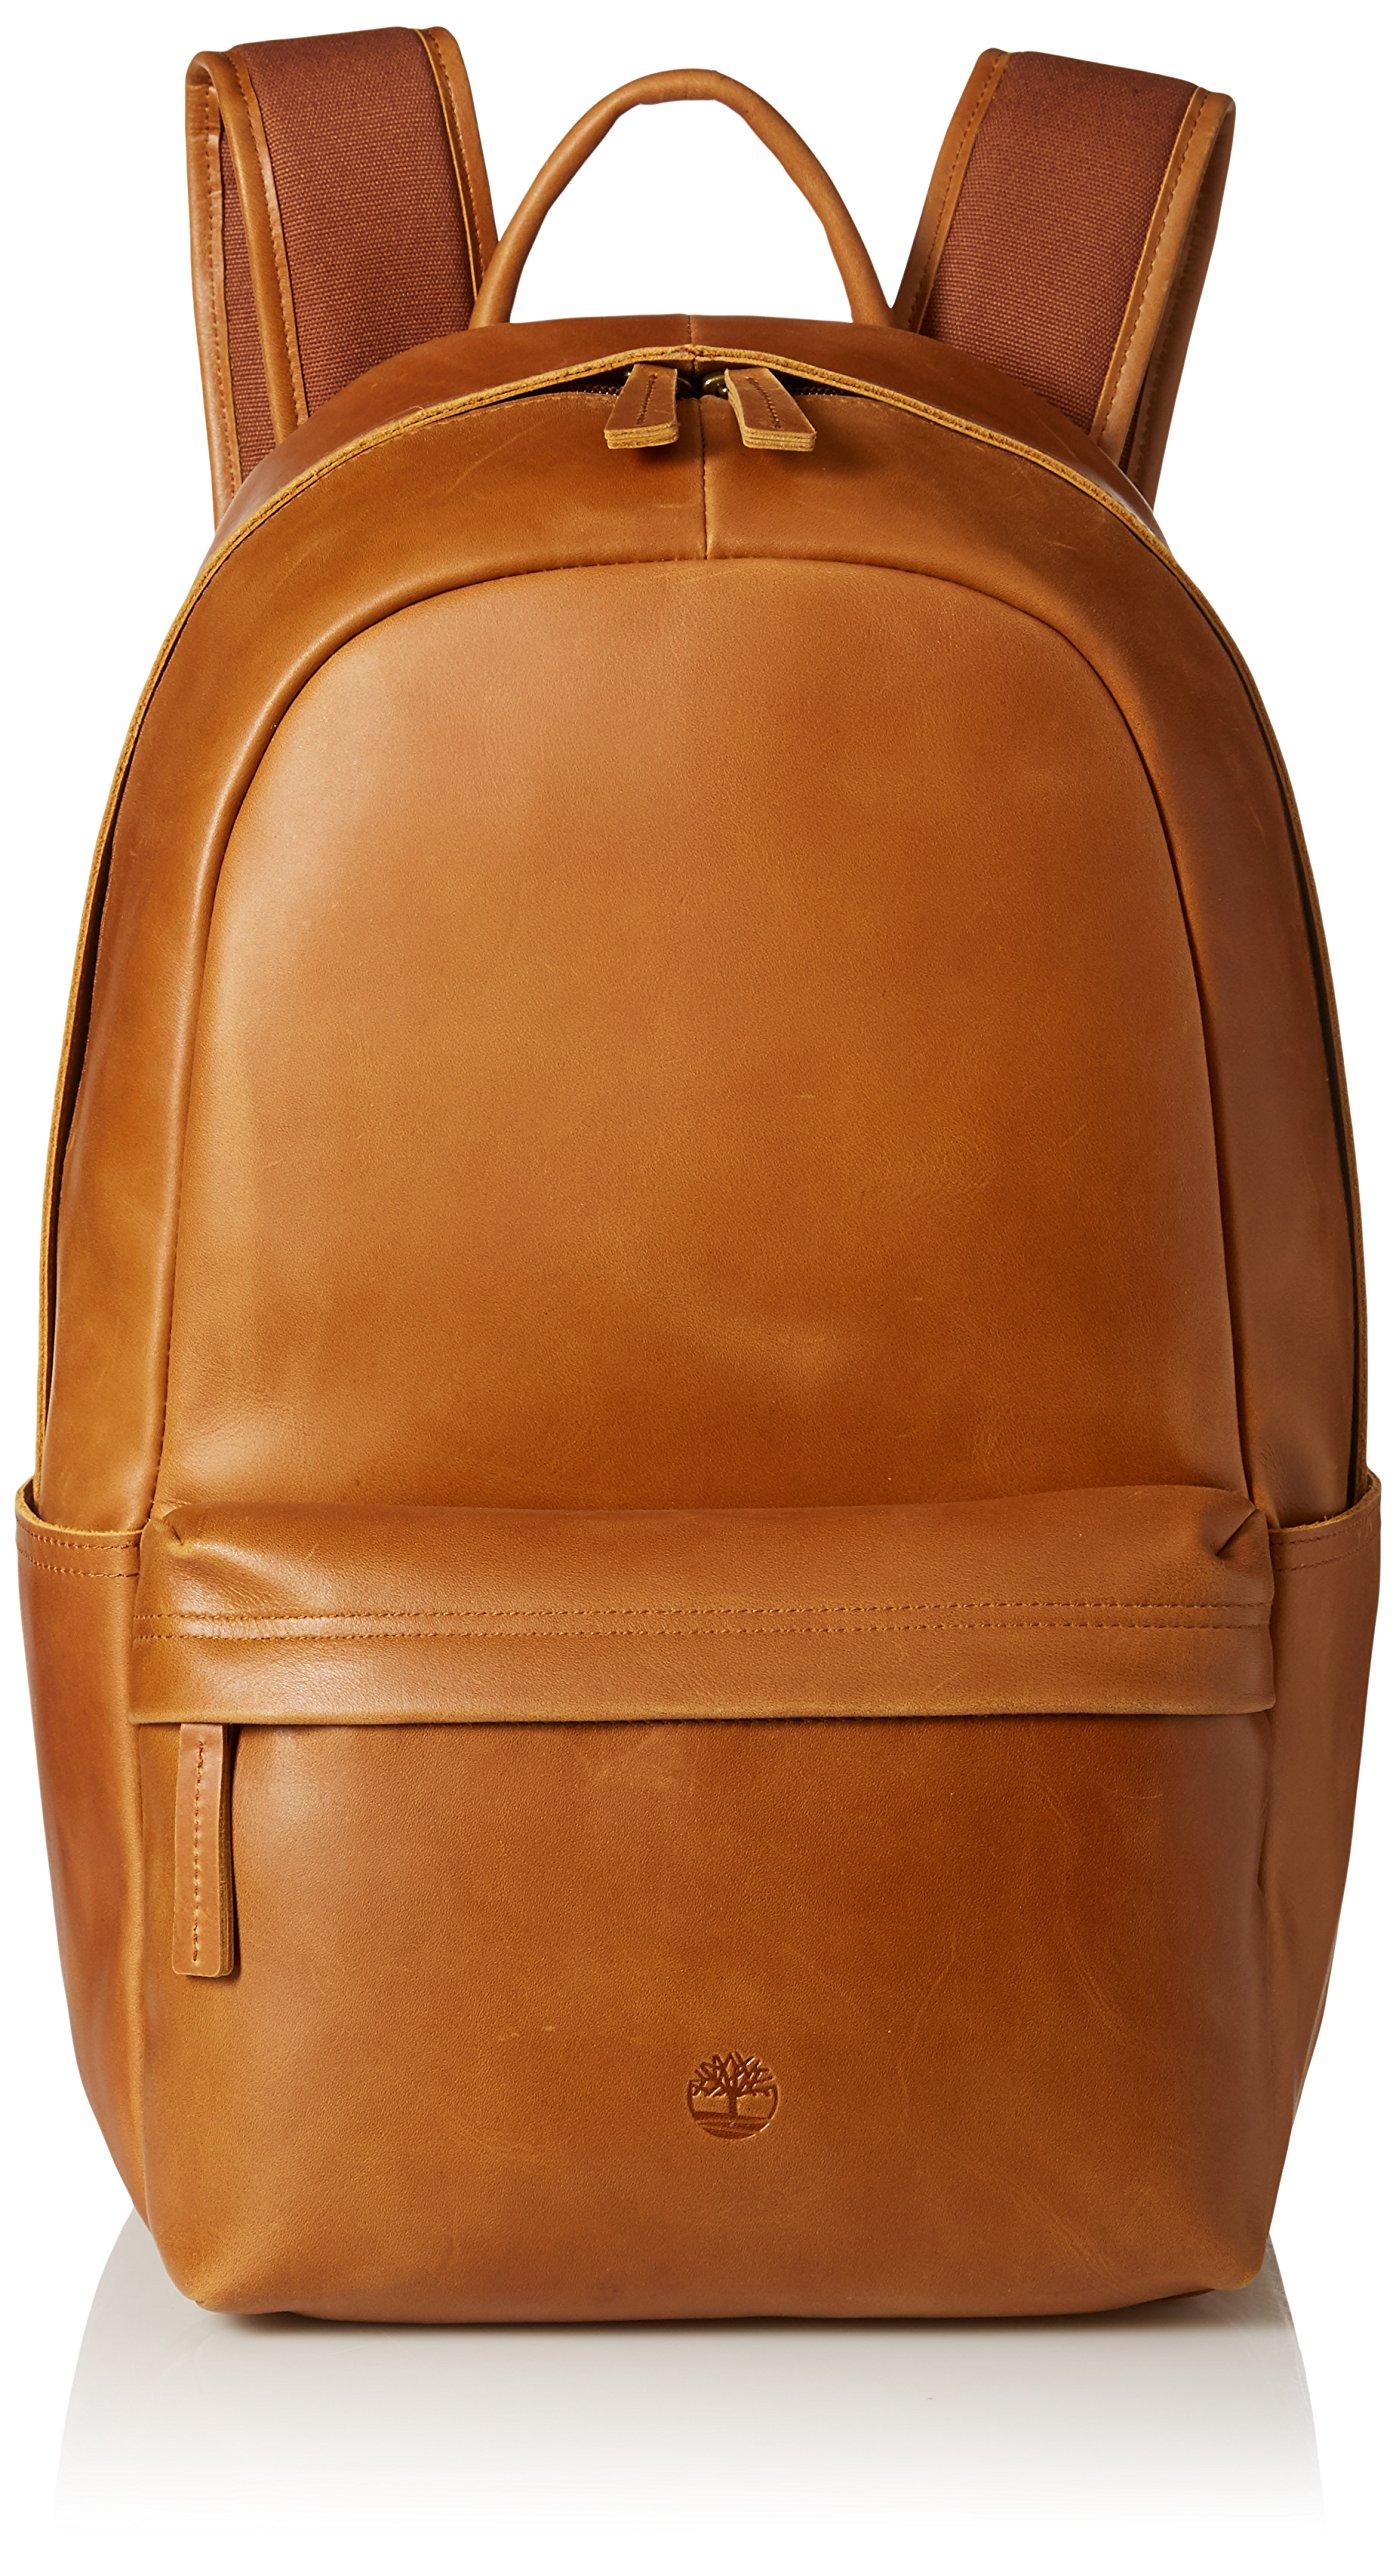 Timberland Men's Tuckerman Leather Backpack, Cognac